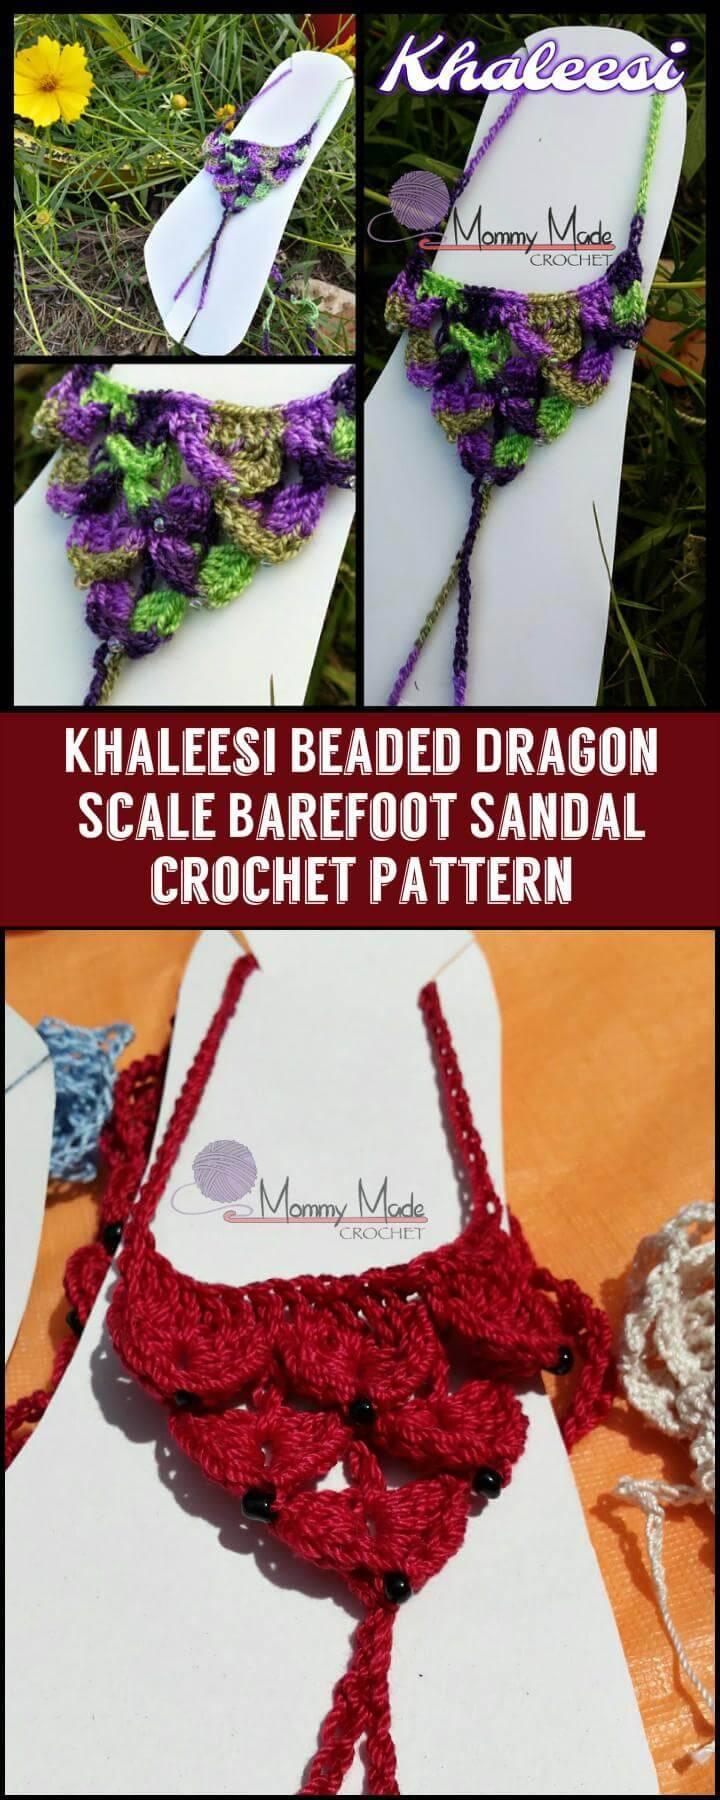 Khaleesi Beaded Dragon Scale Barefoot Sandal crochet pattern